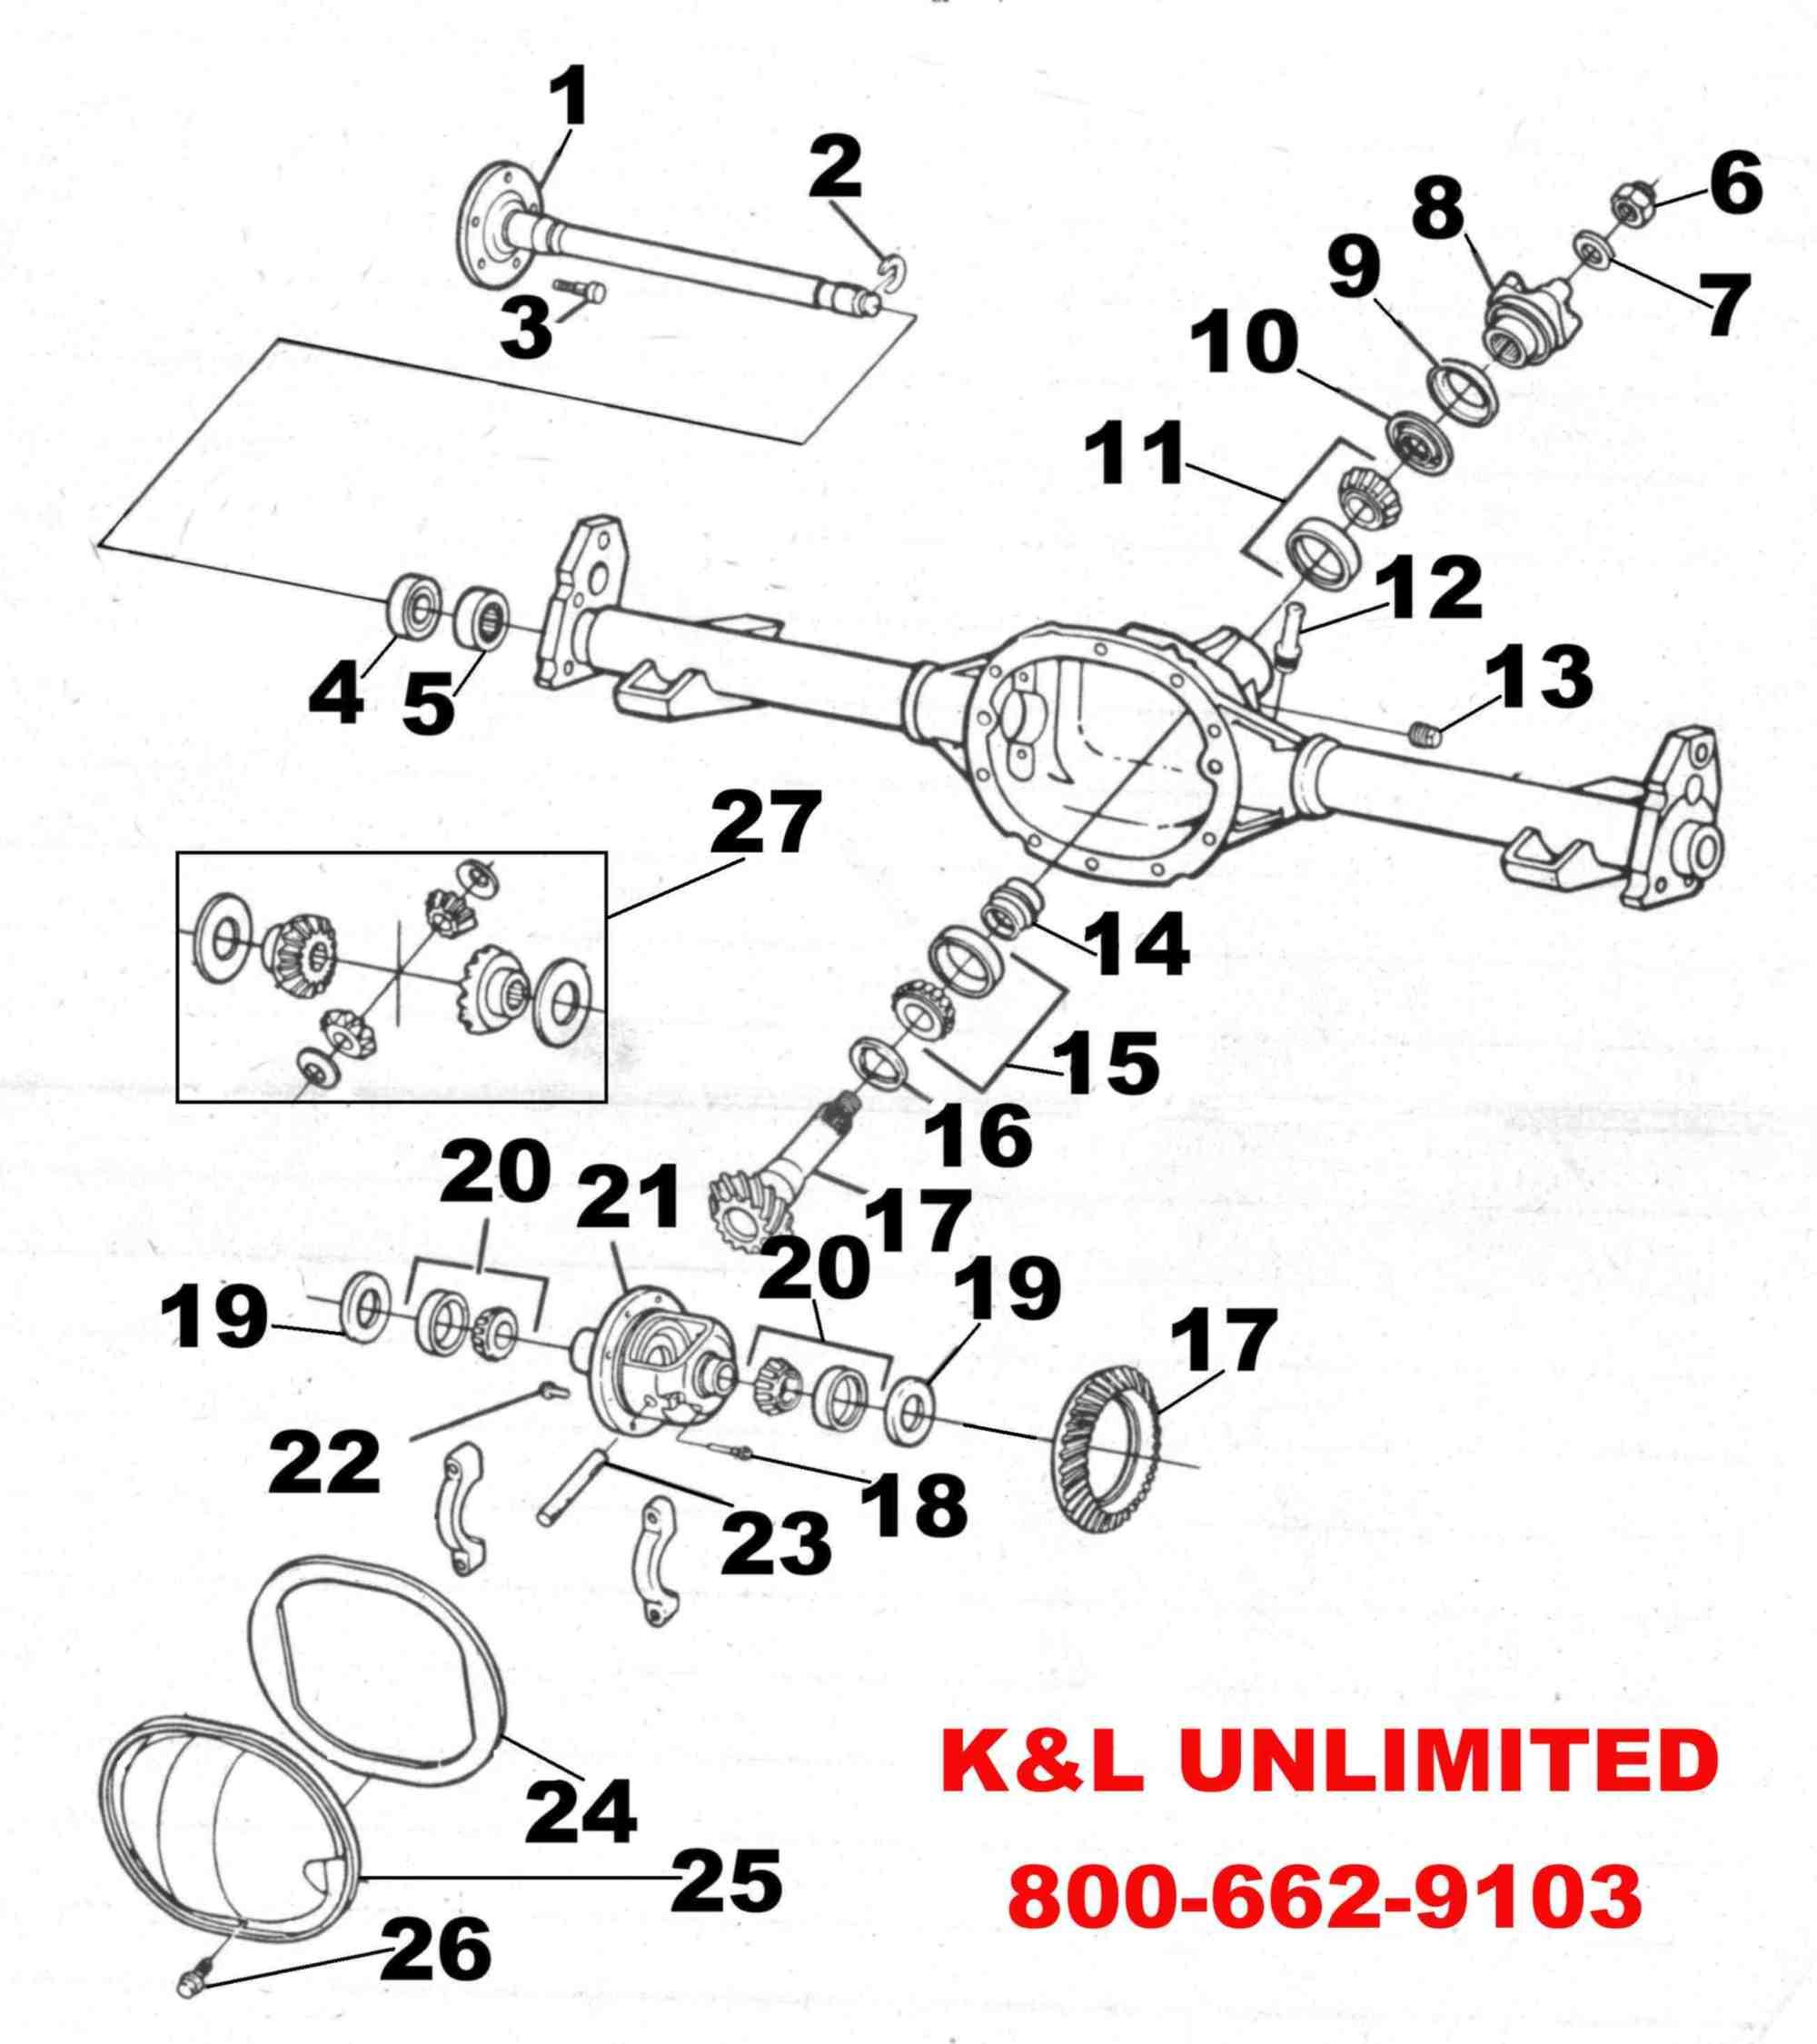 hight resolution of gm 14 bolt diagram manual e book gm 10 bolt diagram wiring schematic diagram 187 guenstige